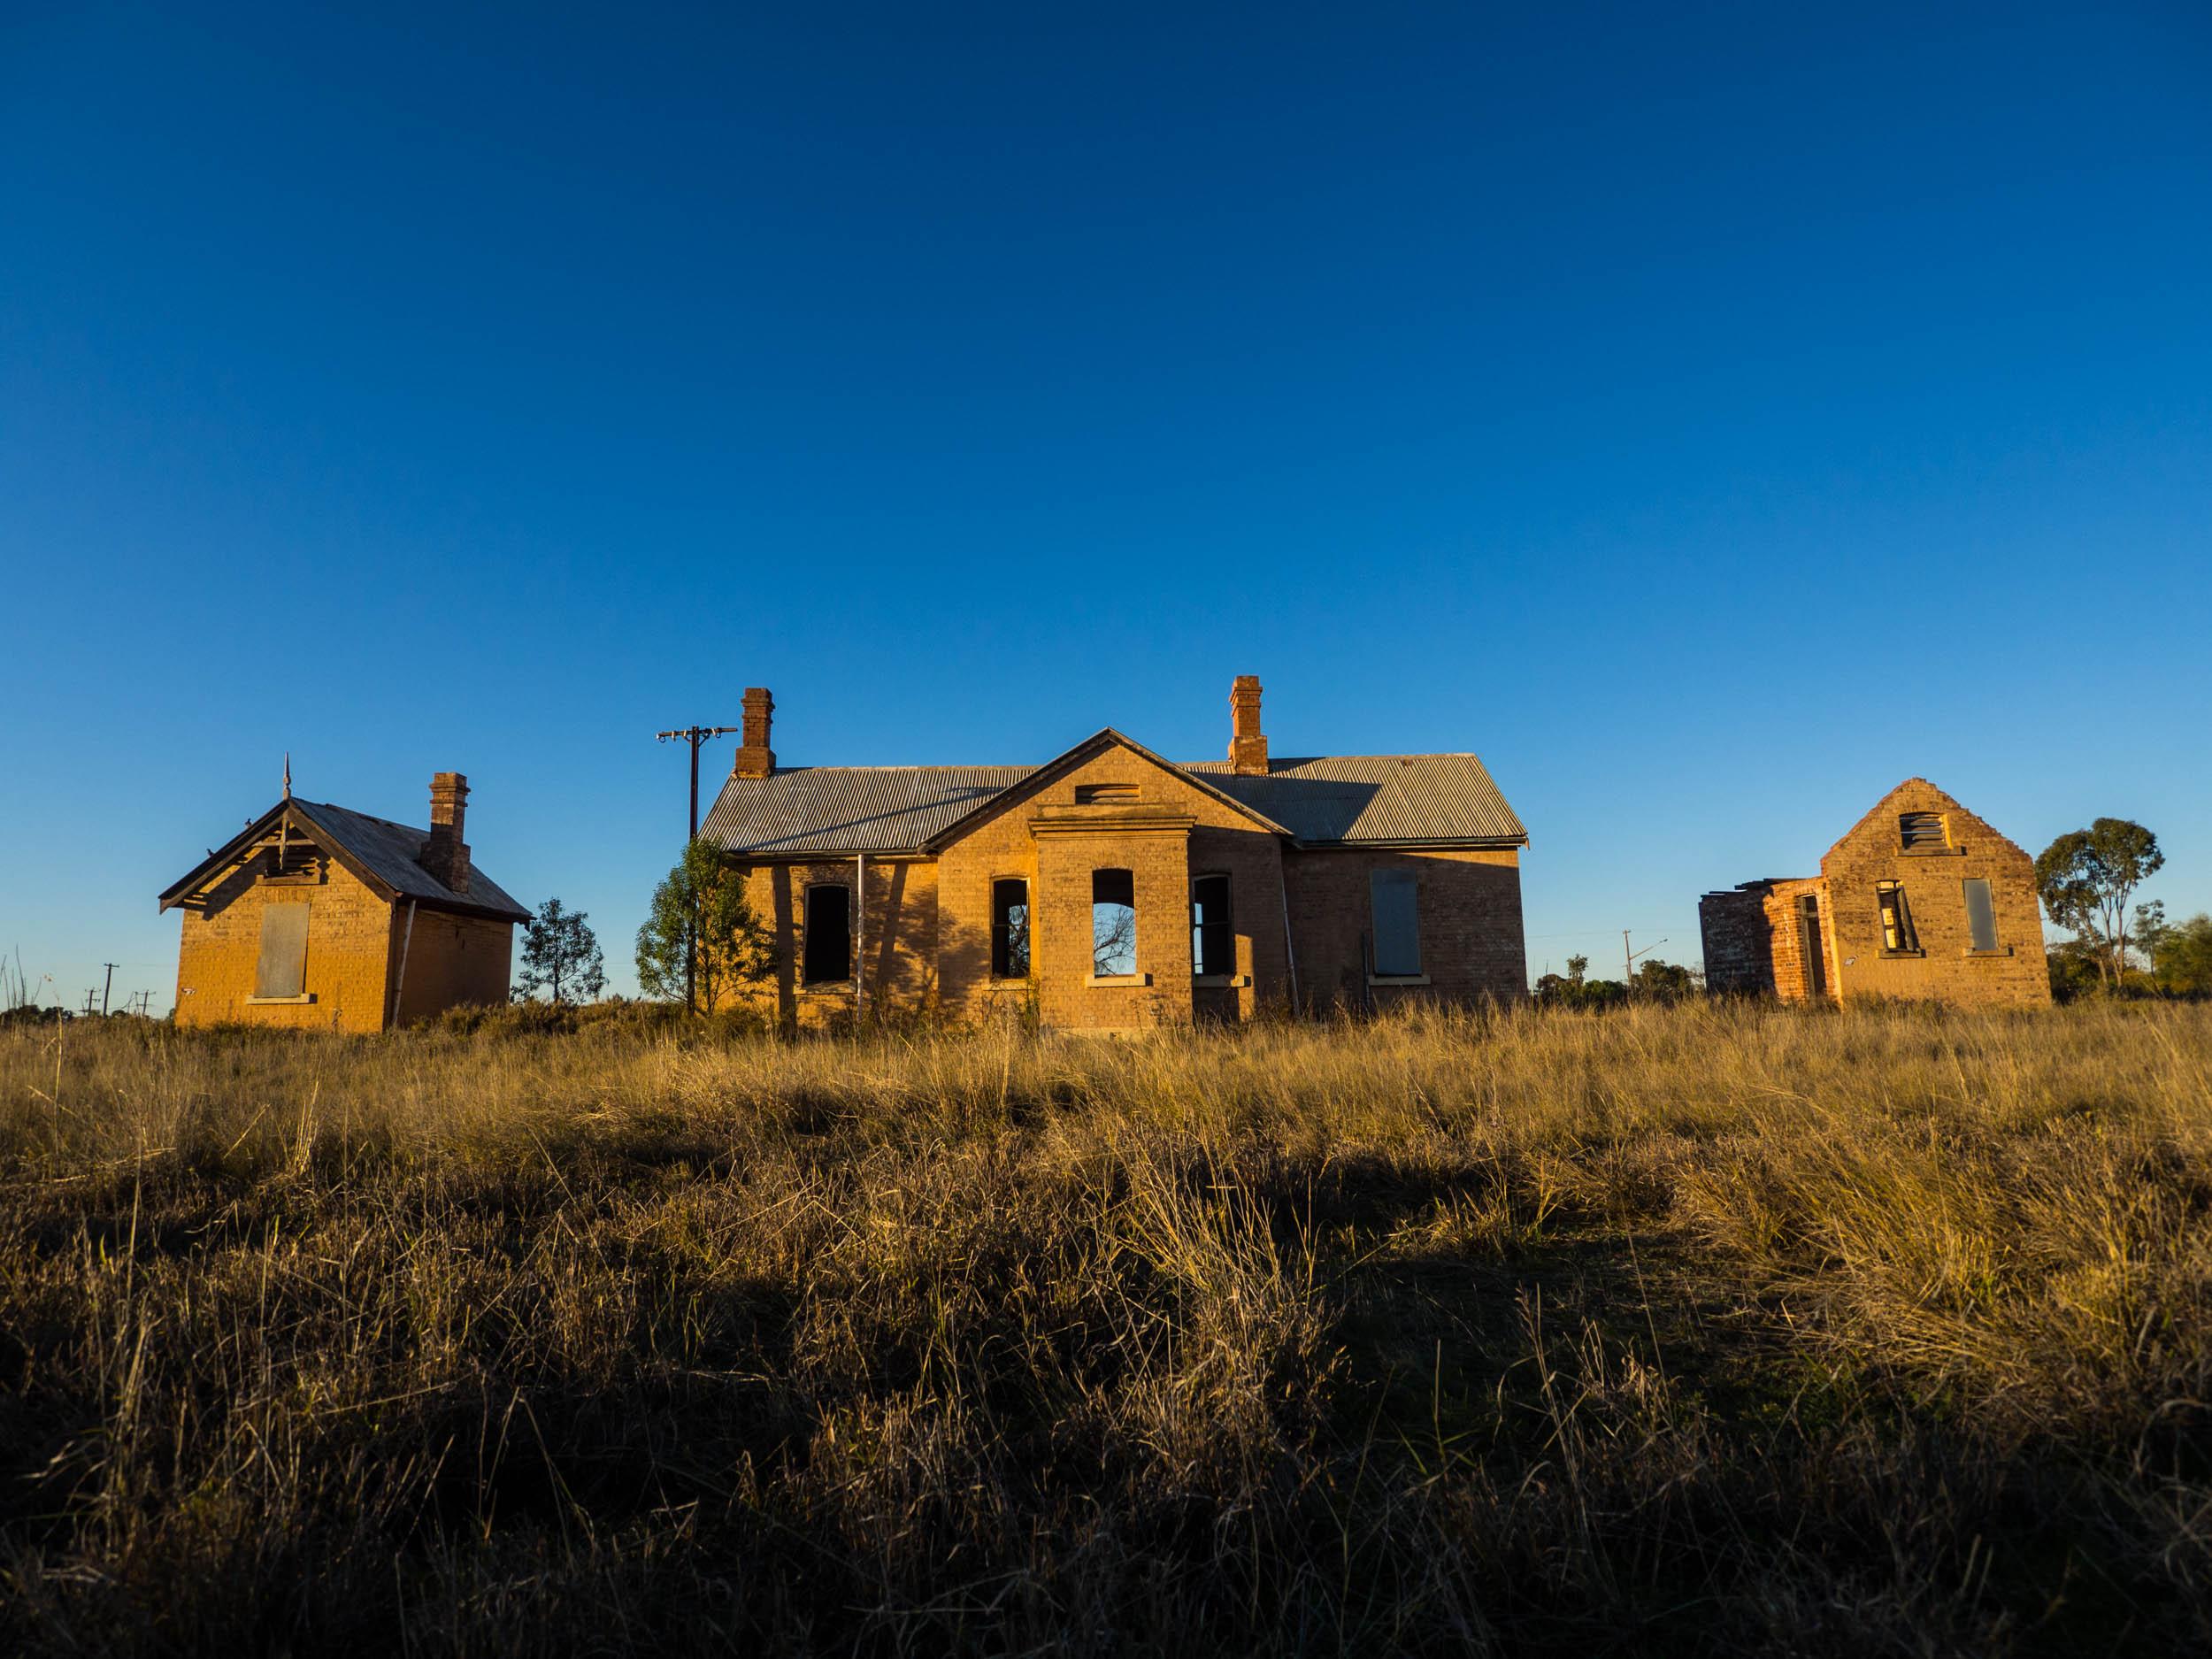 outback photography courses sydney-1-5.jpg